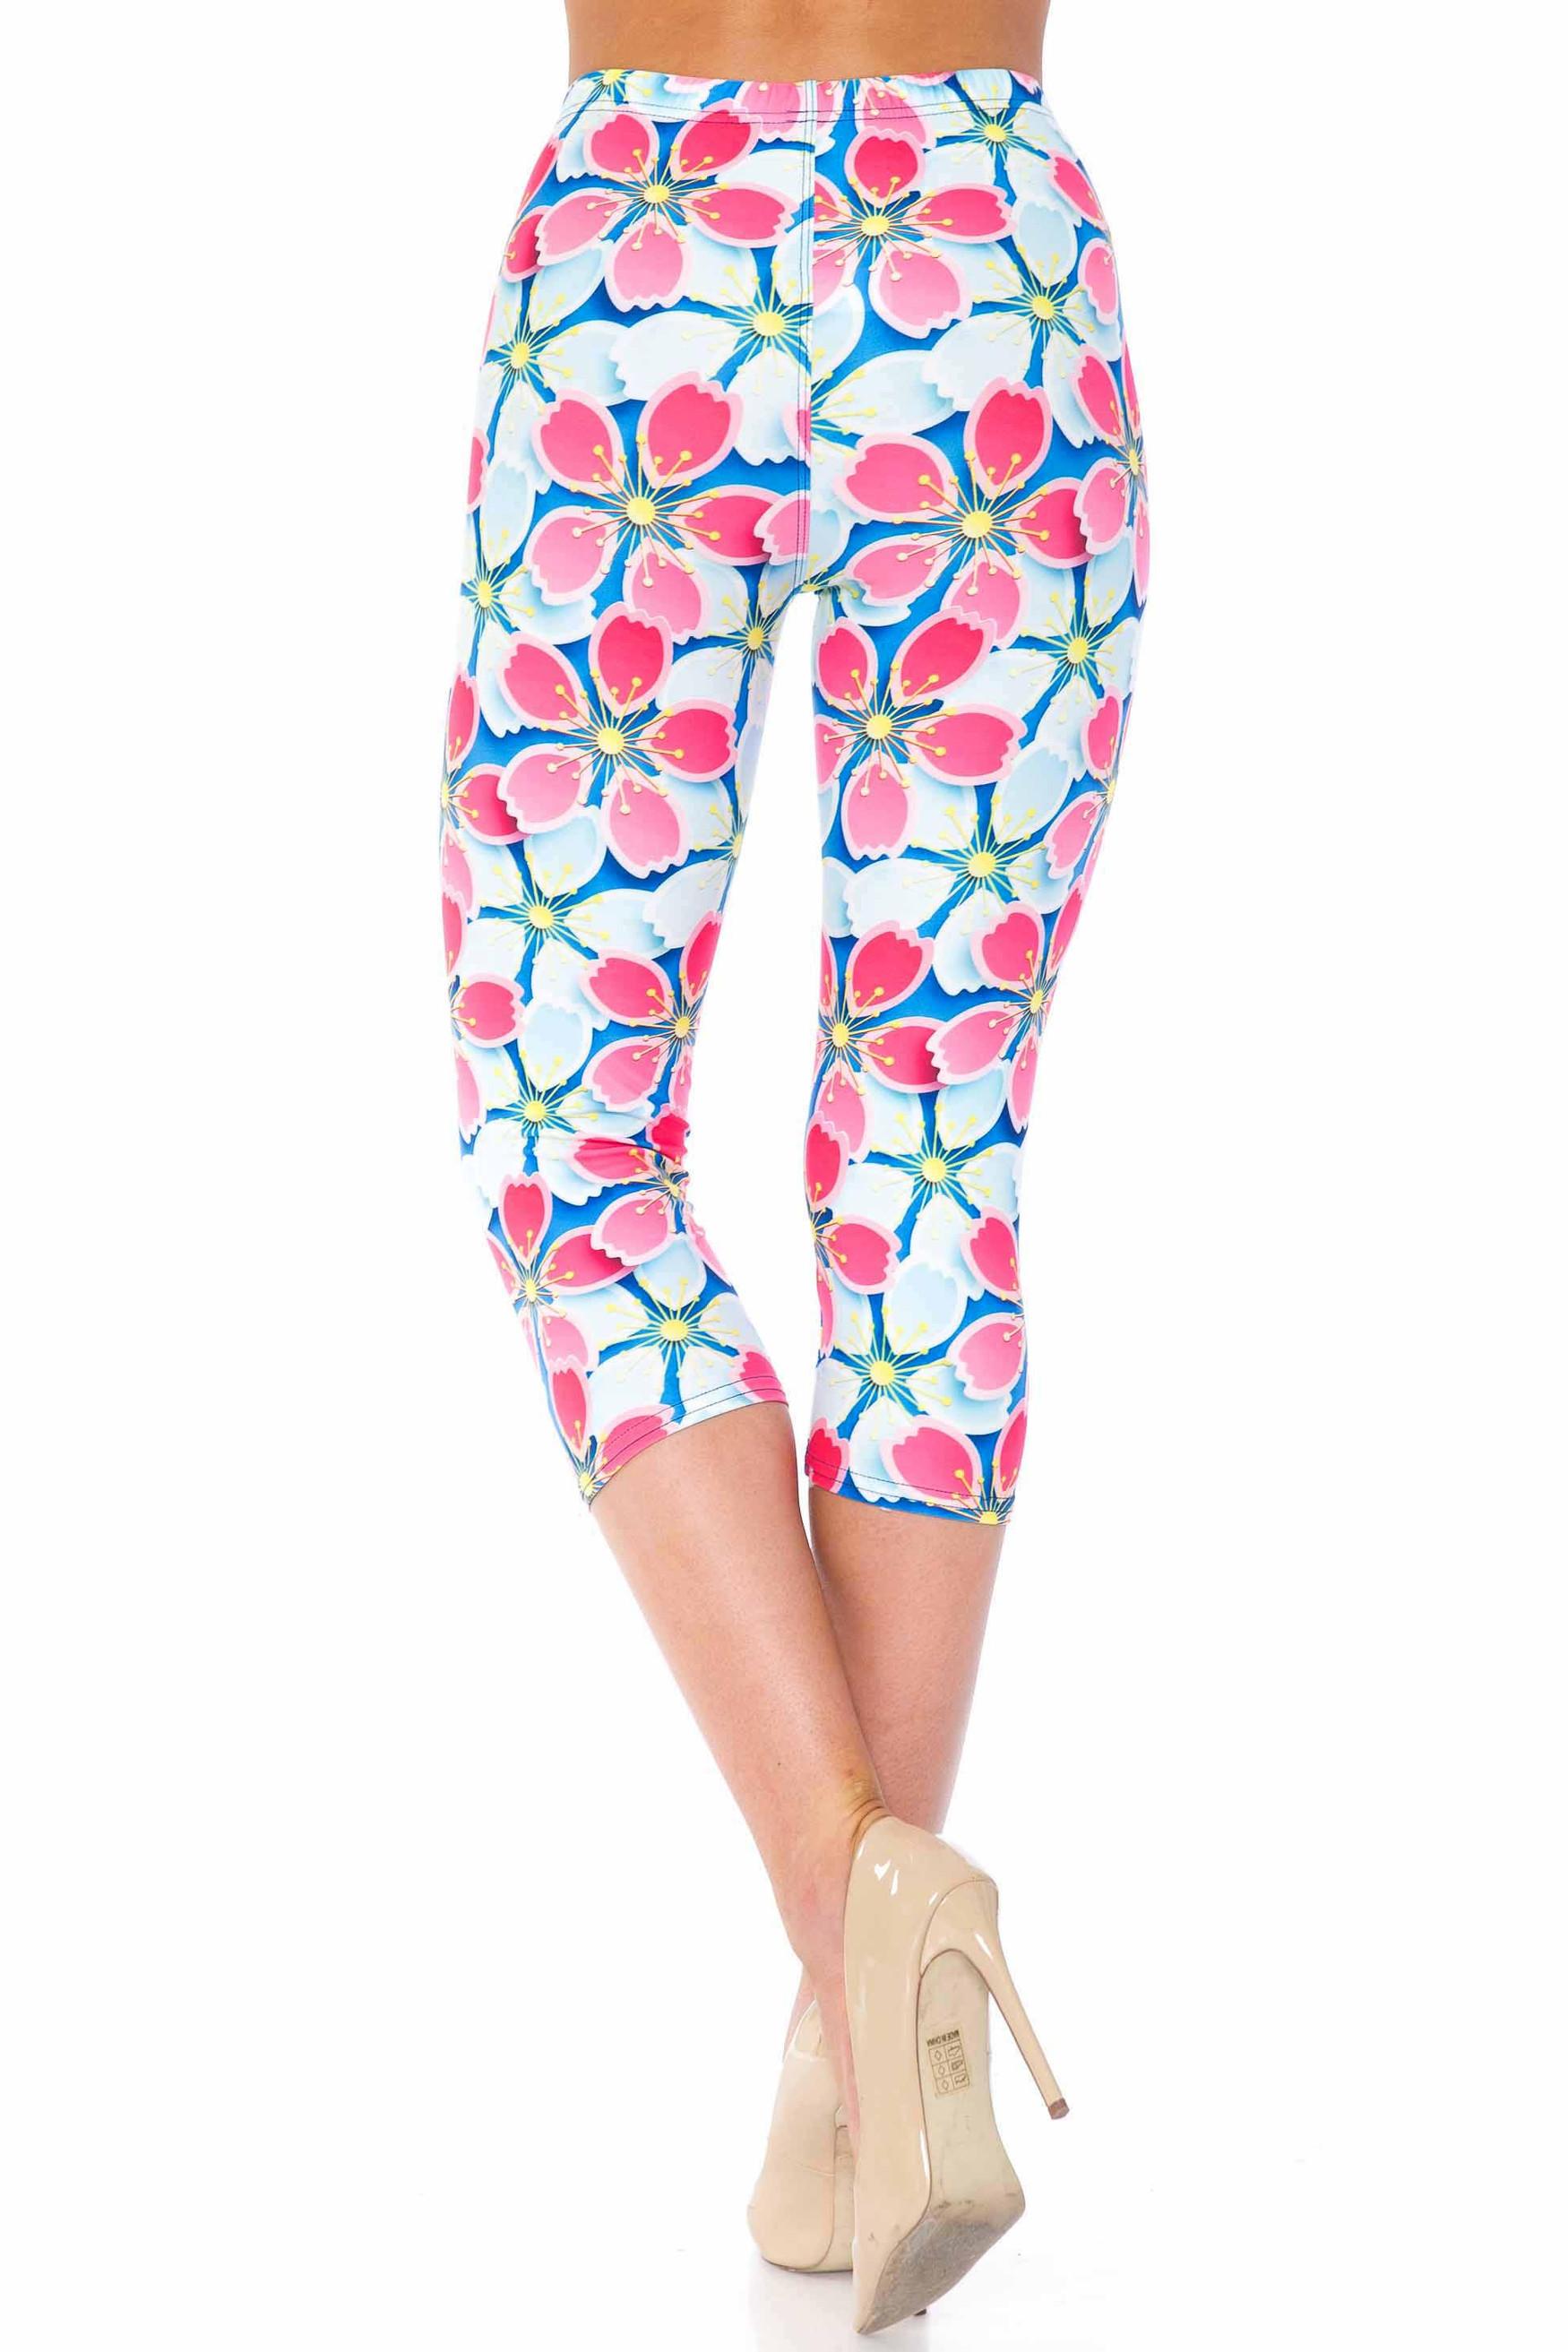 Creamy Soft Pink and Blue Sunshine Floral Capris - USA Fashion™